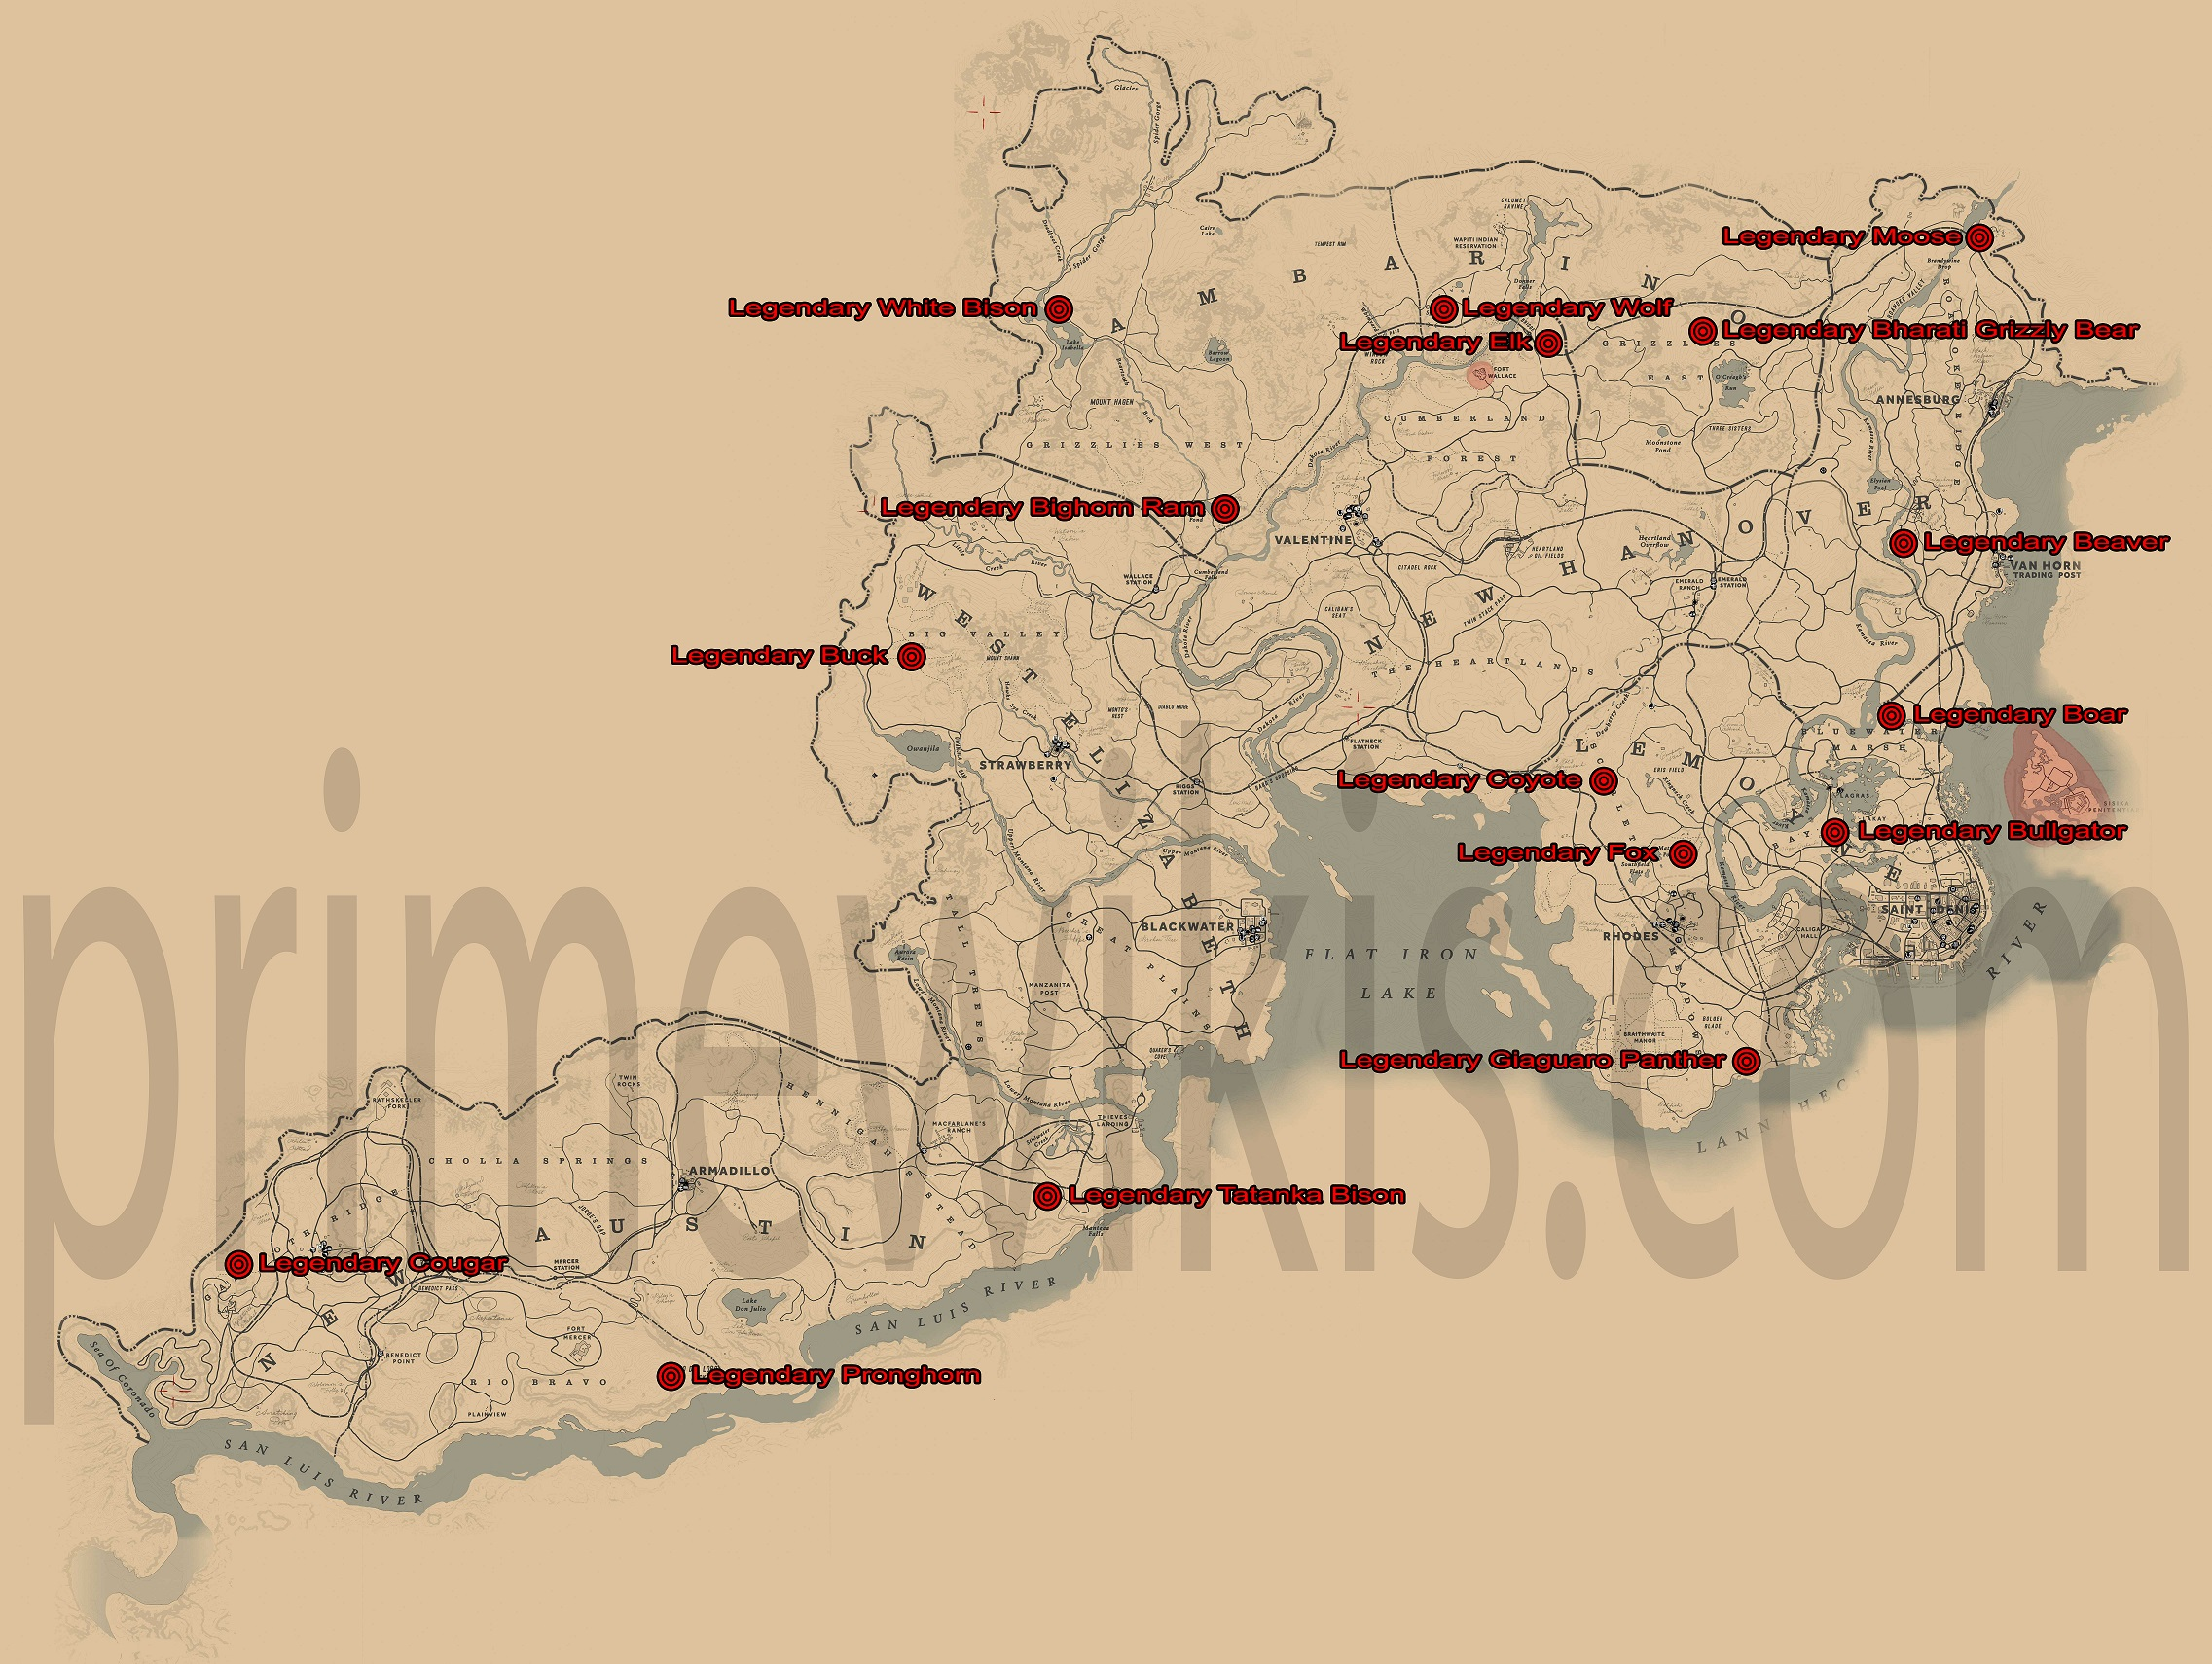 hight resolution of rdr2 legendary animals locations map